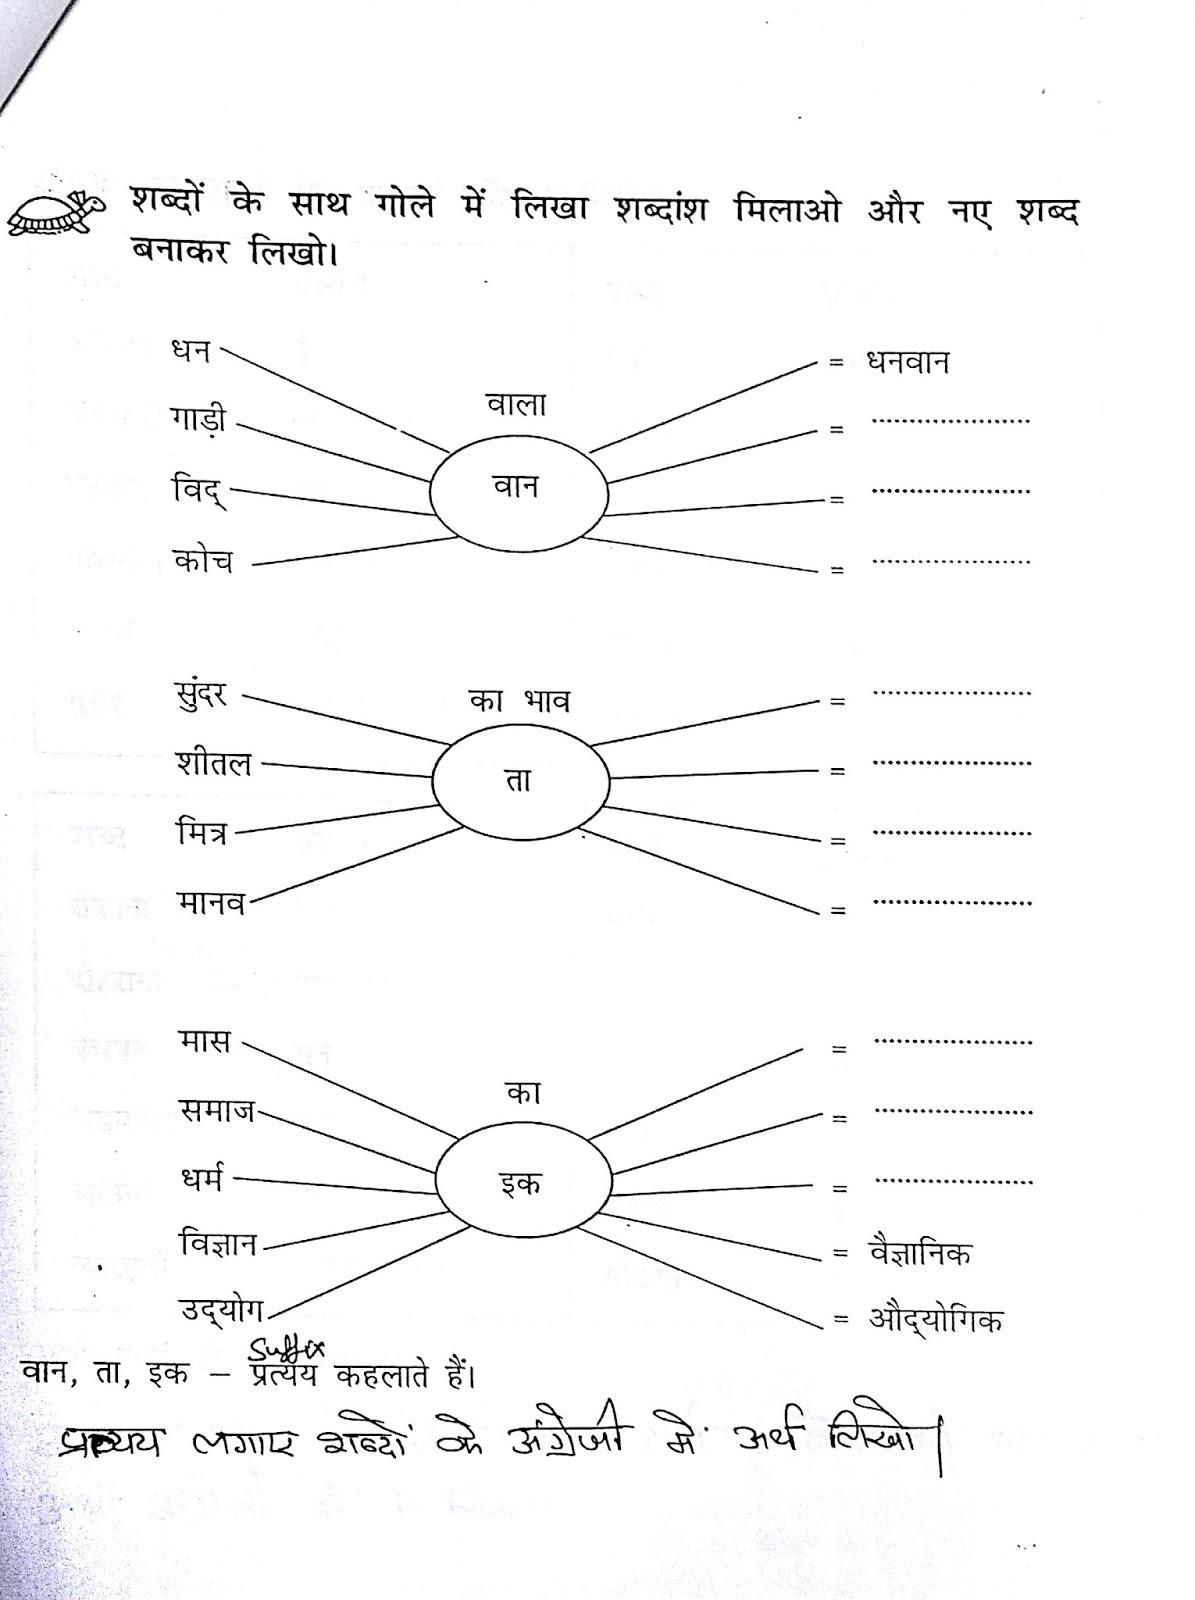 worksheet Hindi Grammar Worksheets For Class 6 workbooks hindi worksheets for grade 4 free printable 100 3 icse english grammar